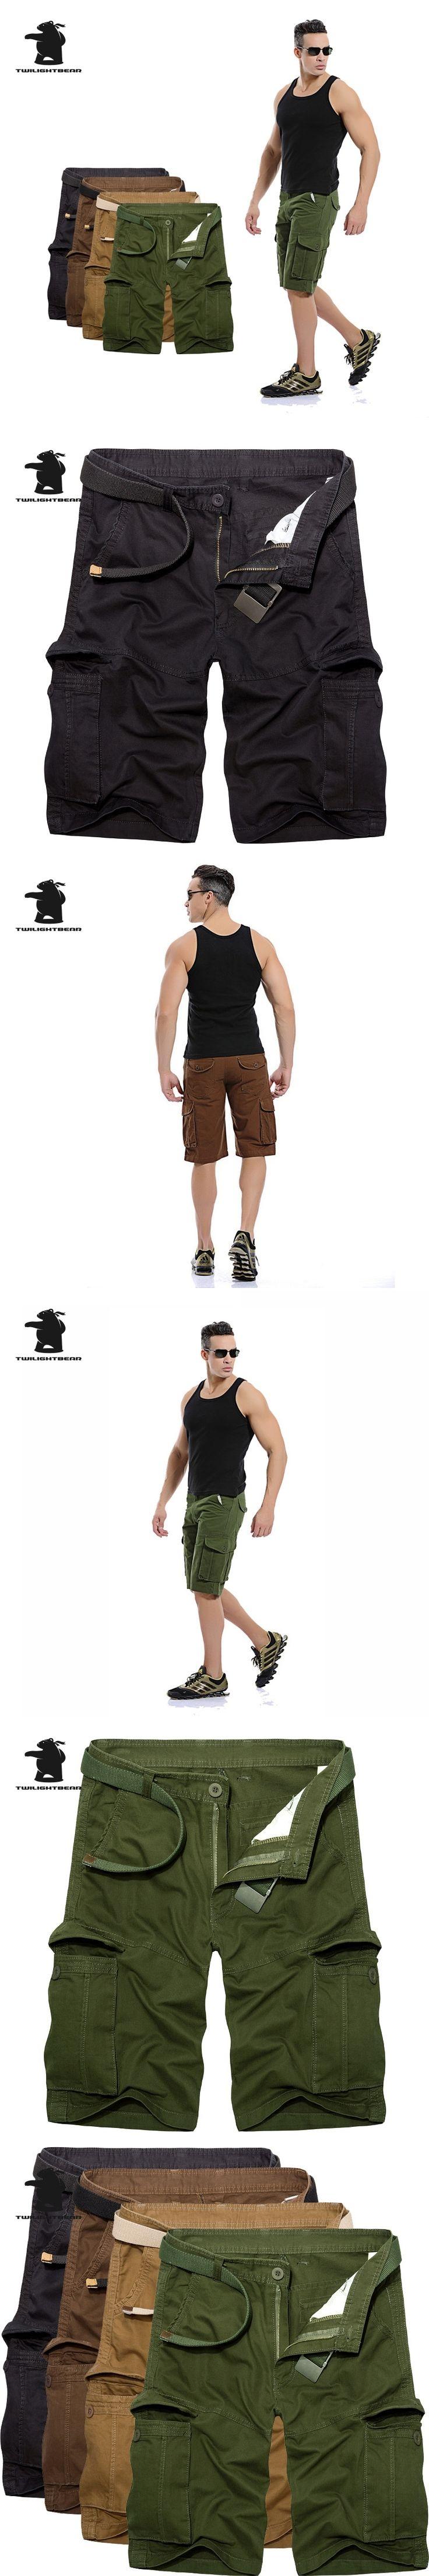 2017 New men's Cargo Shorts New Designer Fashion Multi-pocket Plus Size Cotton Casual Tooling Shorts Men 4 Colors CB7EK039